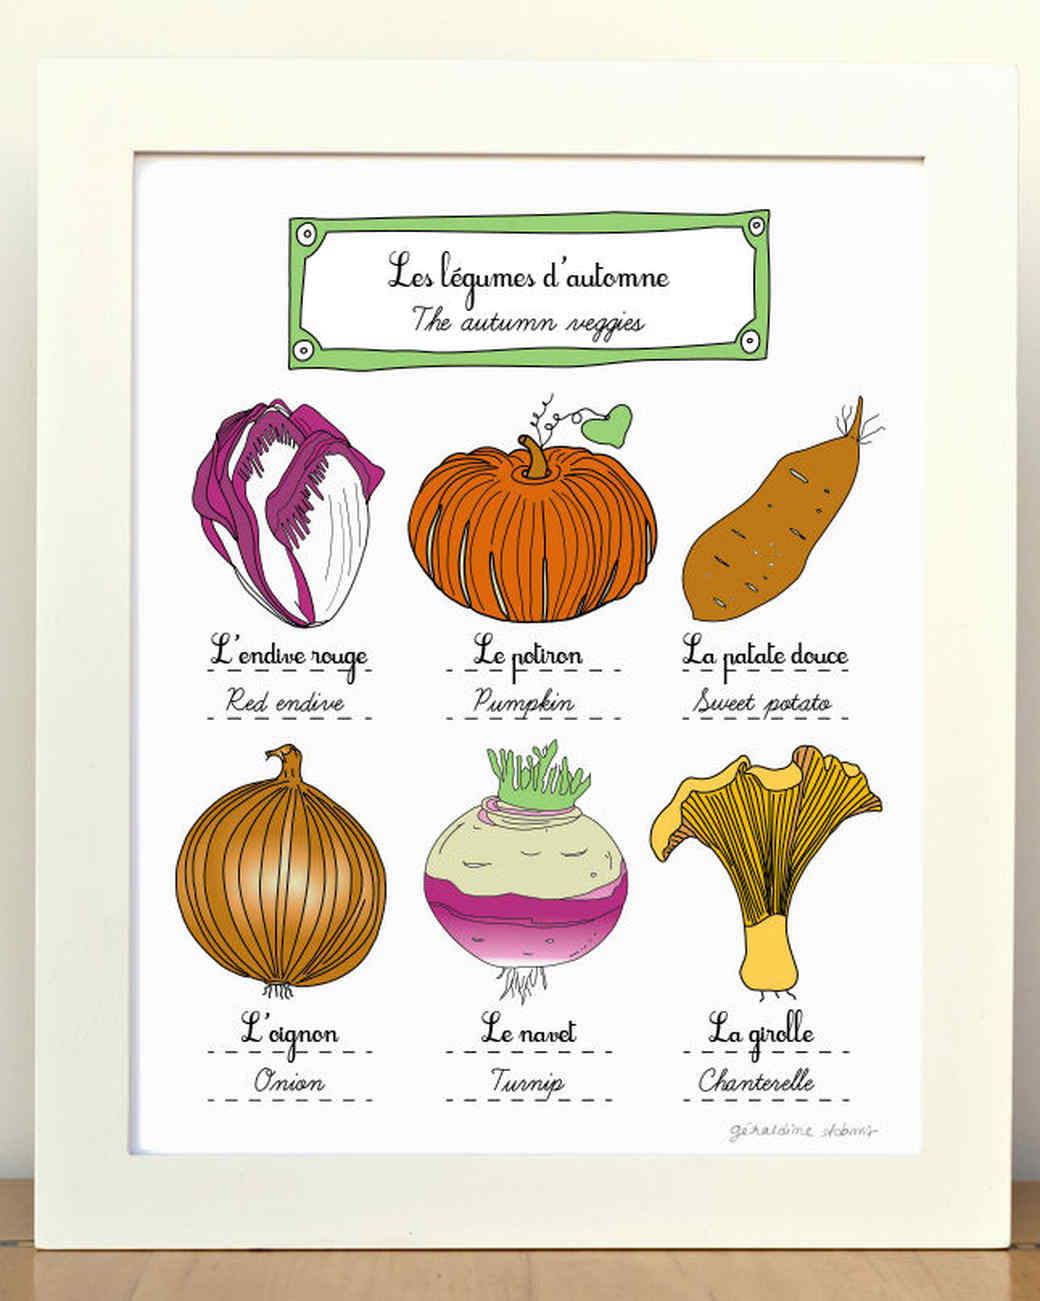 geraldine-adams-french-fall-vegetables-art-print-1014.jpg